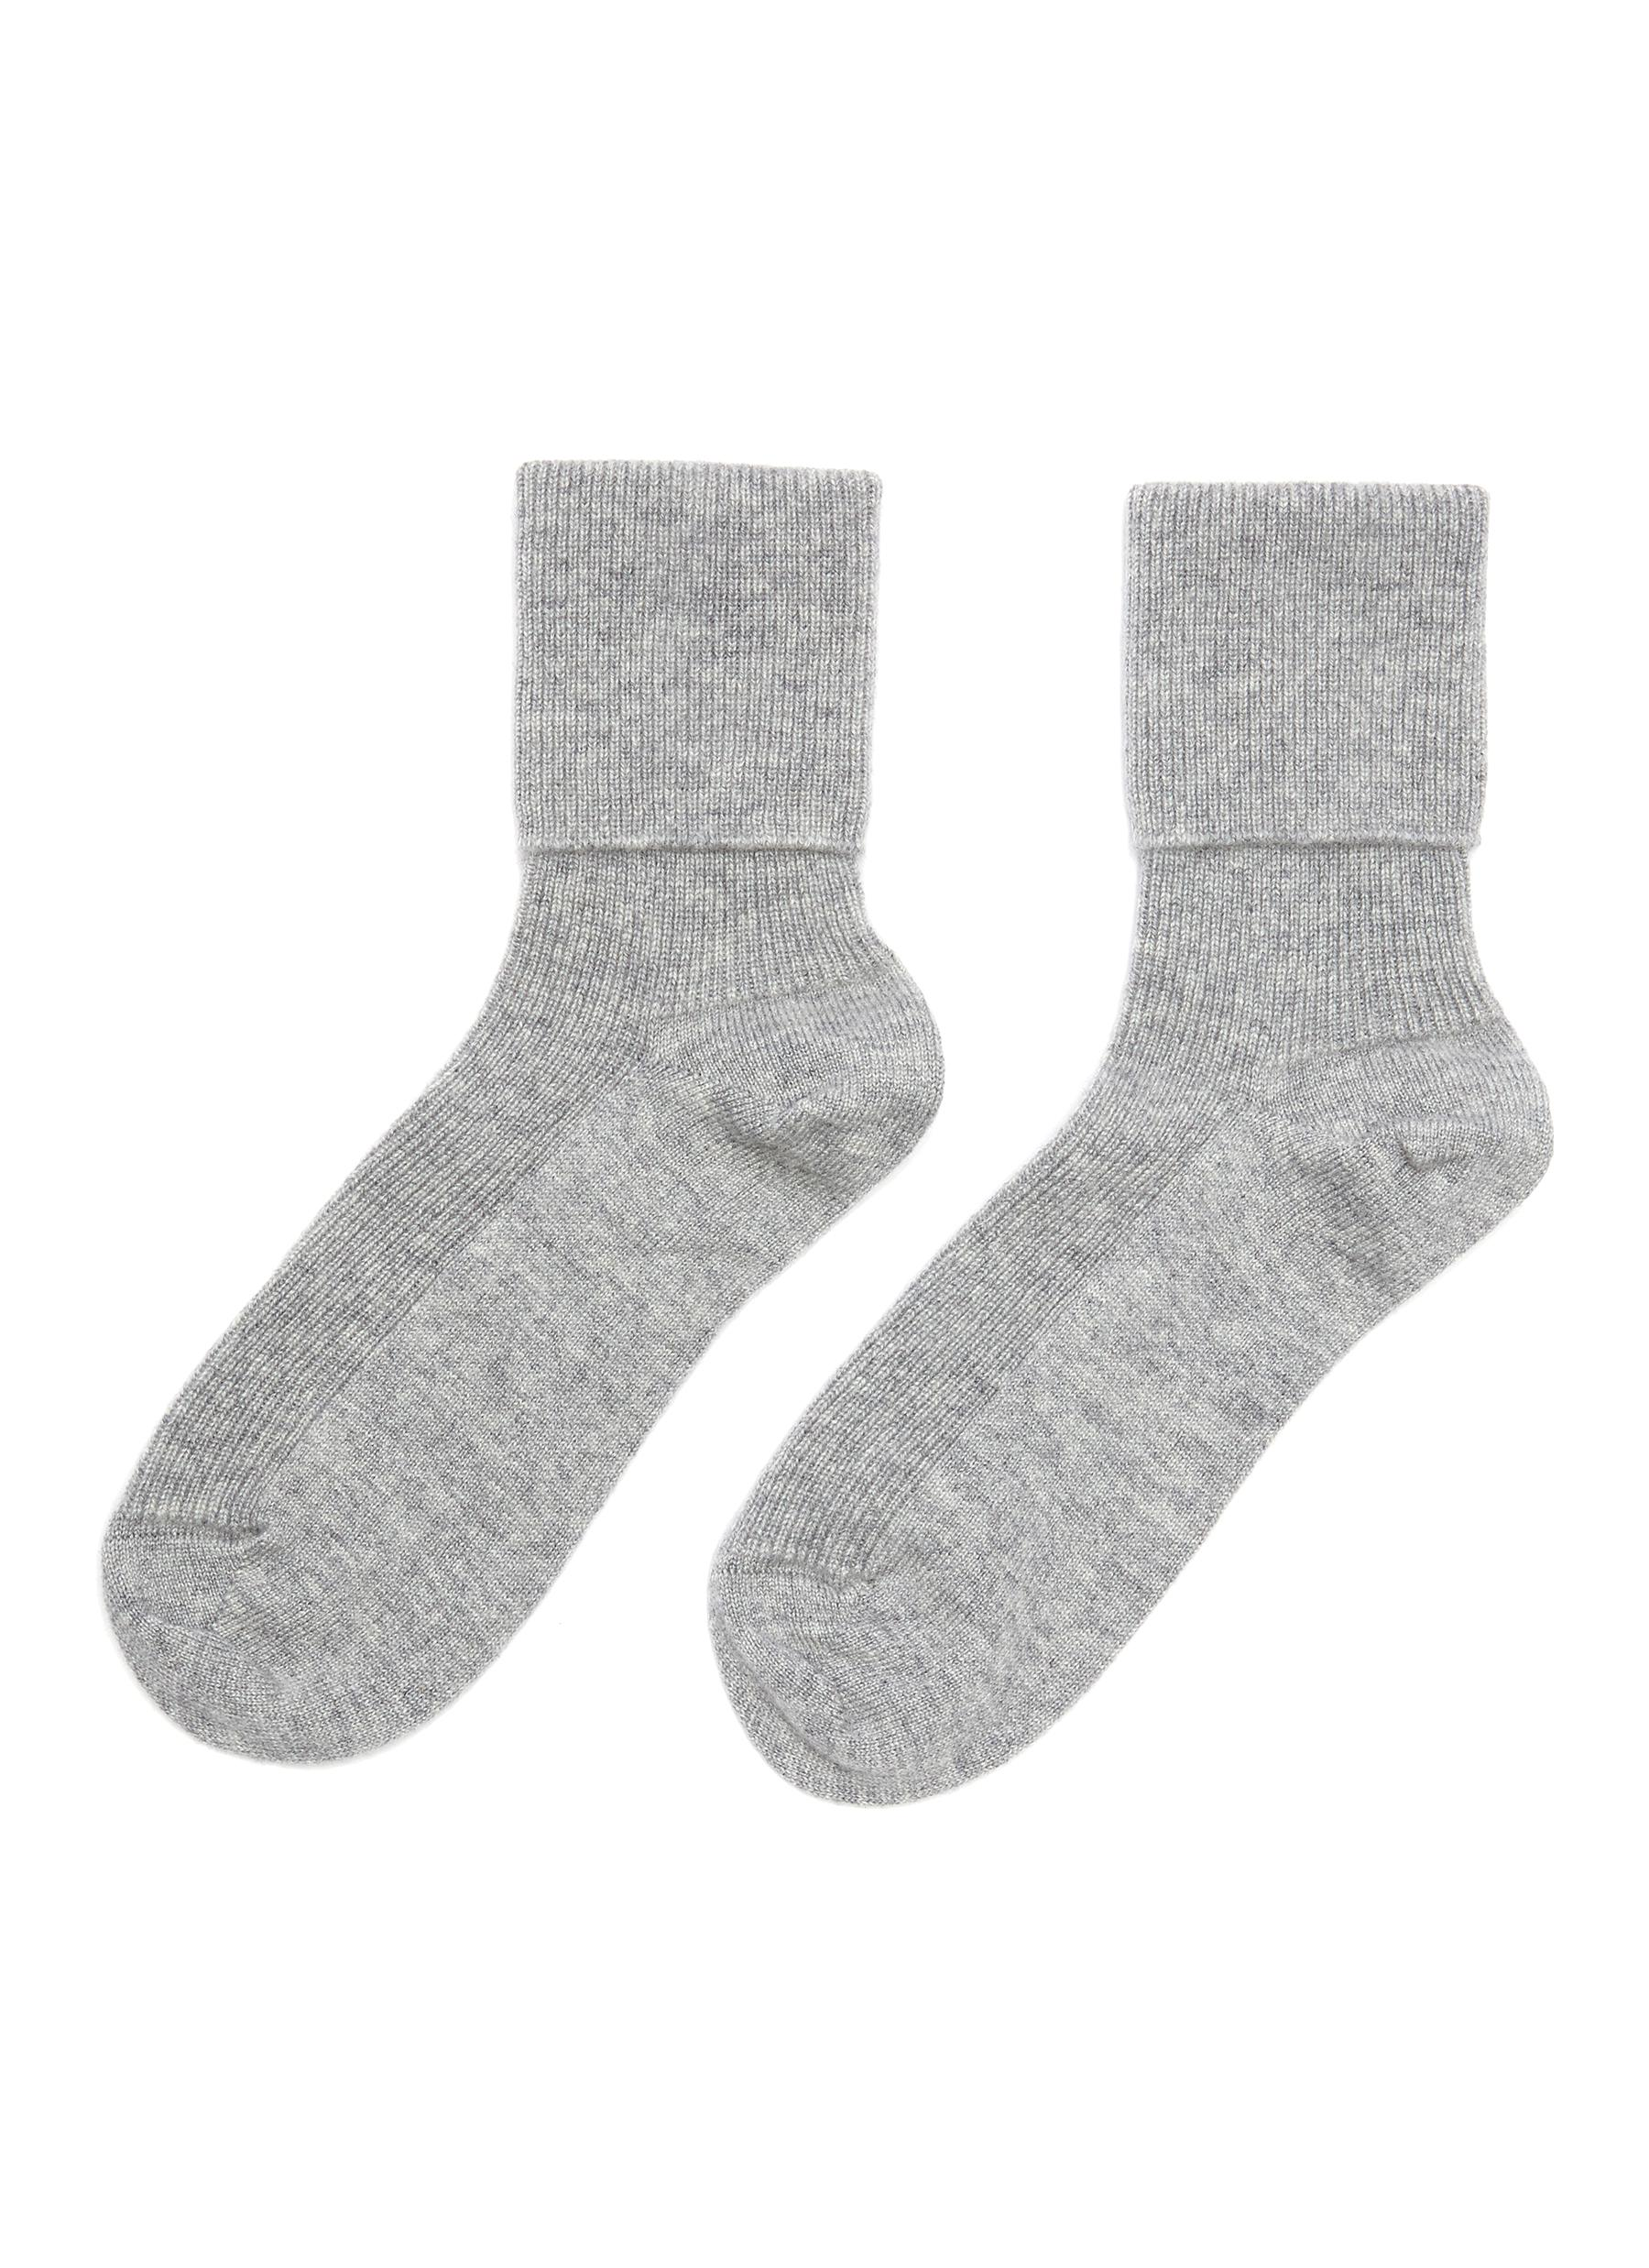 Ribbed Ankle Socks